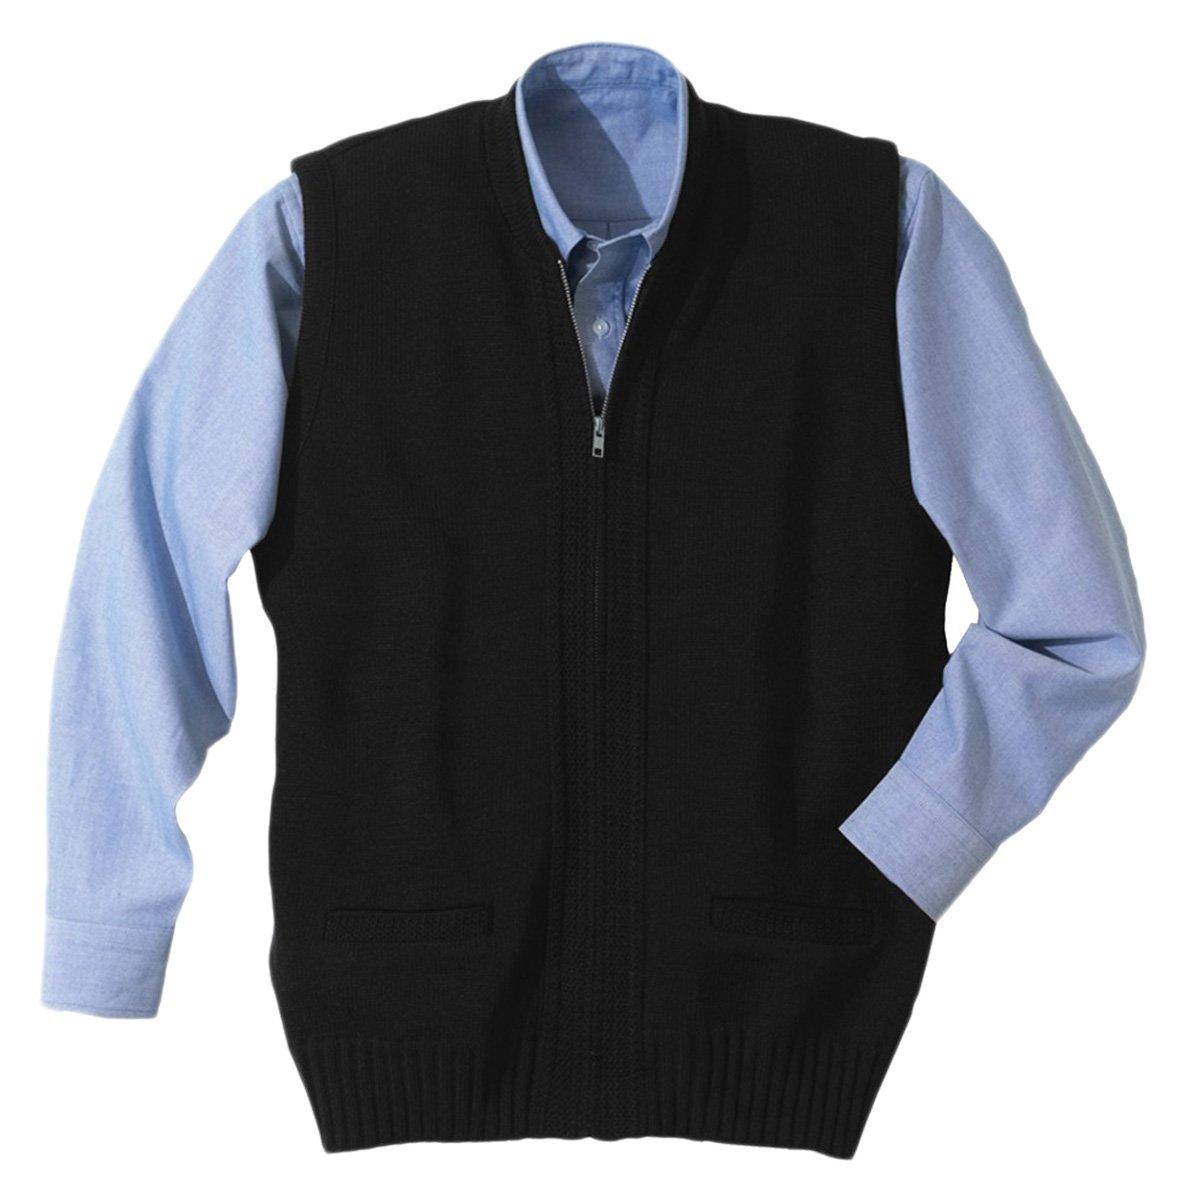 Ed Garments Men's Heavy Weight Two Pocket Zipper Vest 2XL Black by Edwards Garment